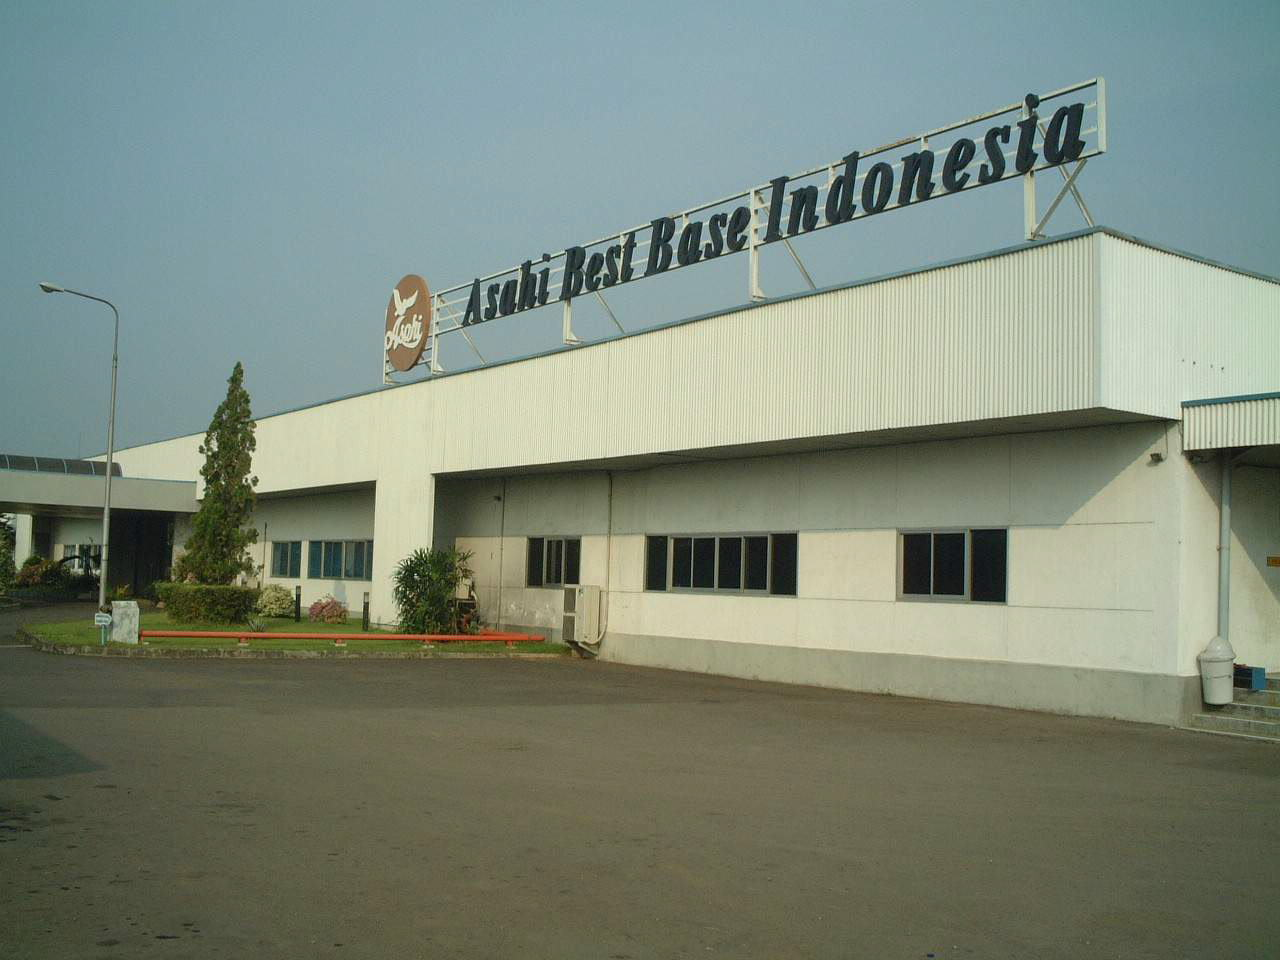 Loker Terbaru Di Kawasan Mm2100 Lowongan Kerja Mm2100 Agustus 2016 Terbaru Bos Loker Lowongan Kerja Kawasan Mm2100 Kawasan Indonesia Review Ebooks